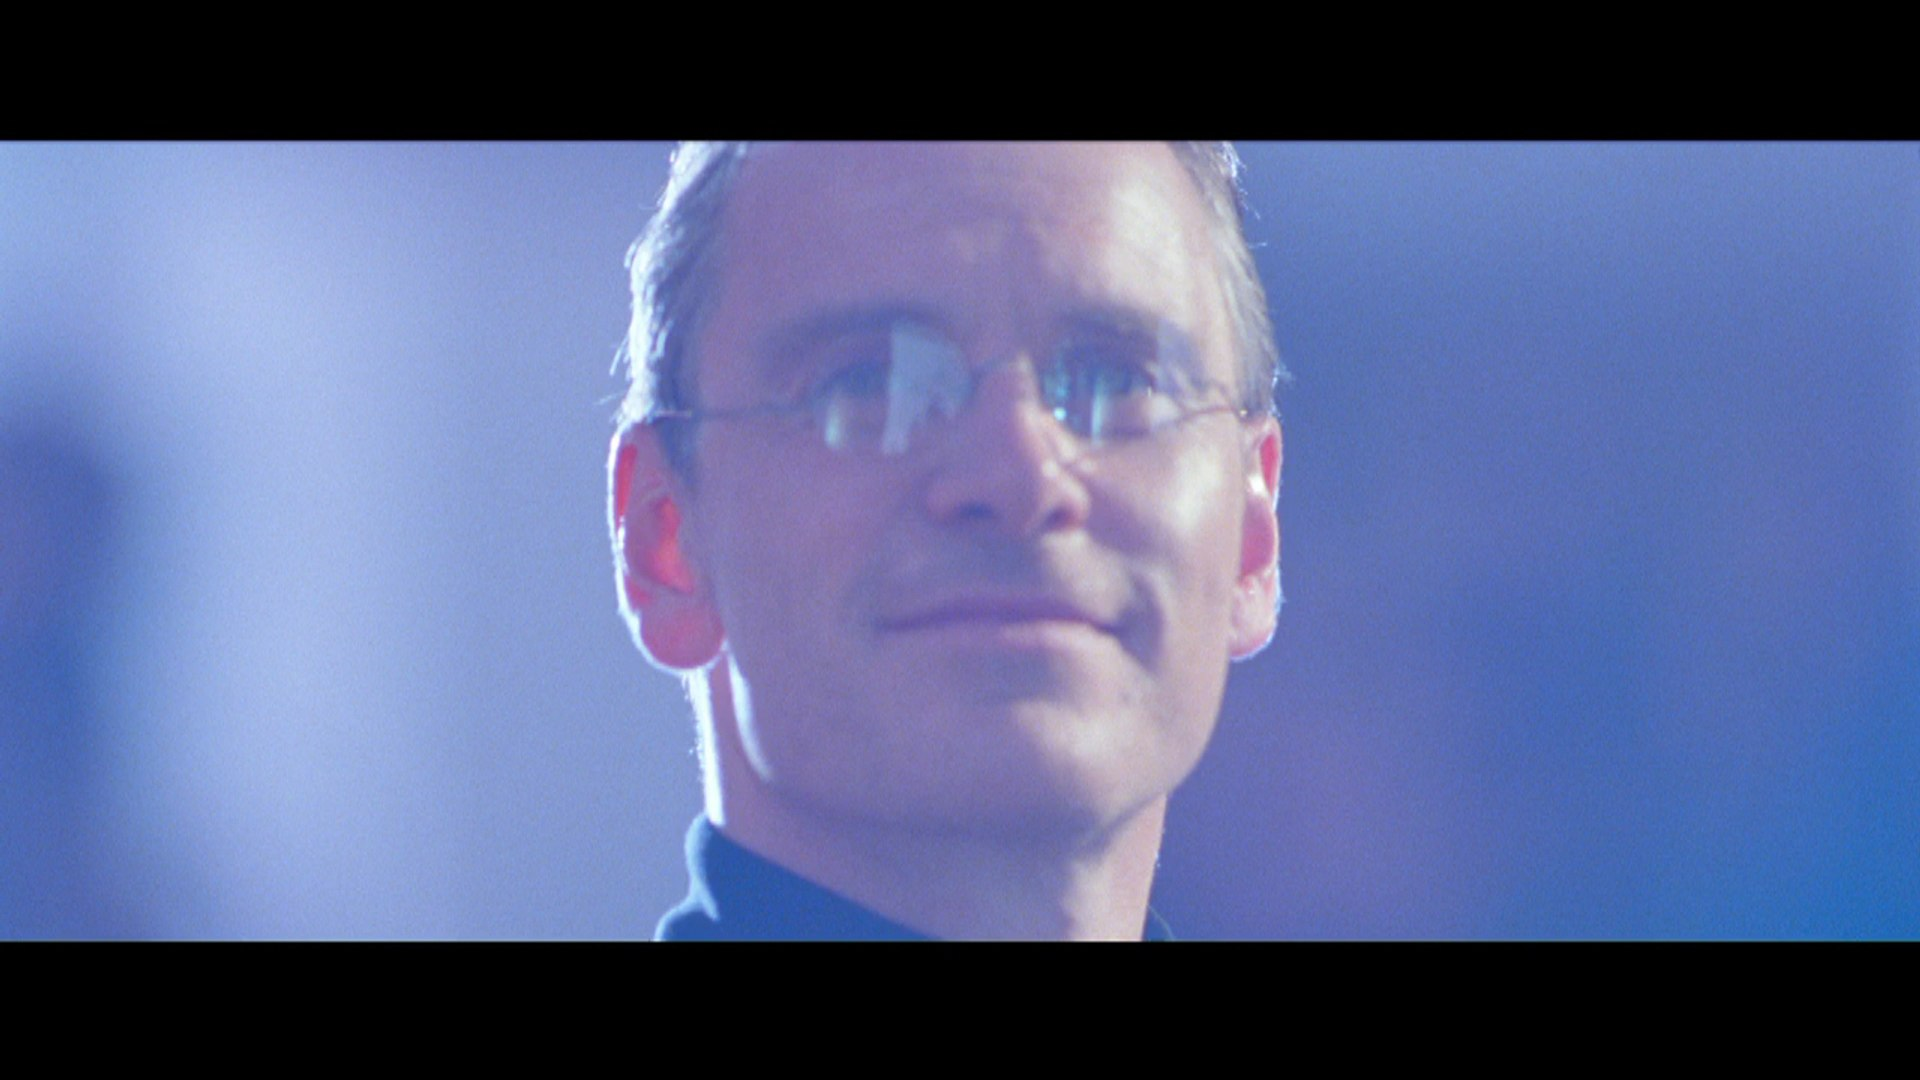 A First Look At 'Steve Jobs'